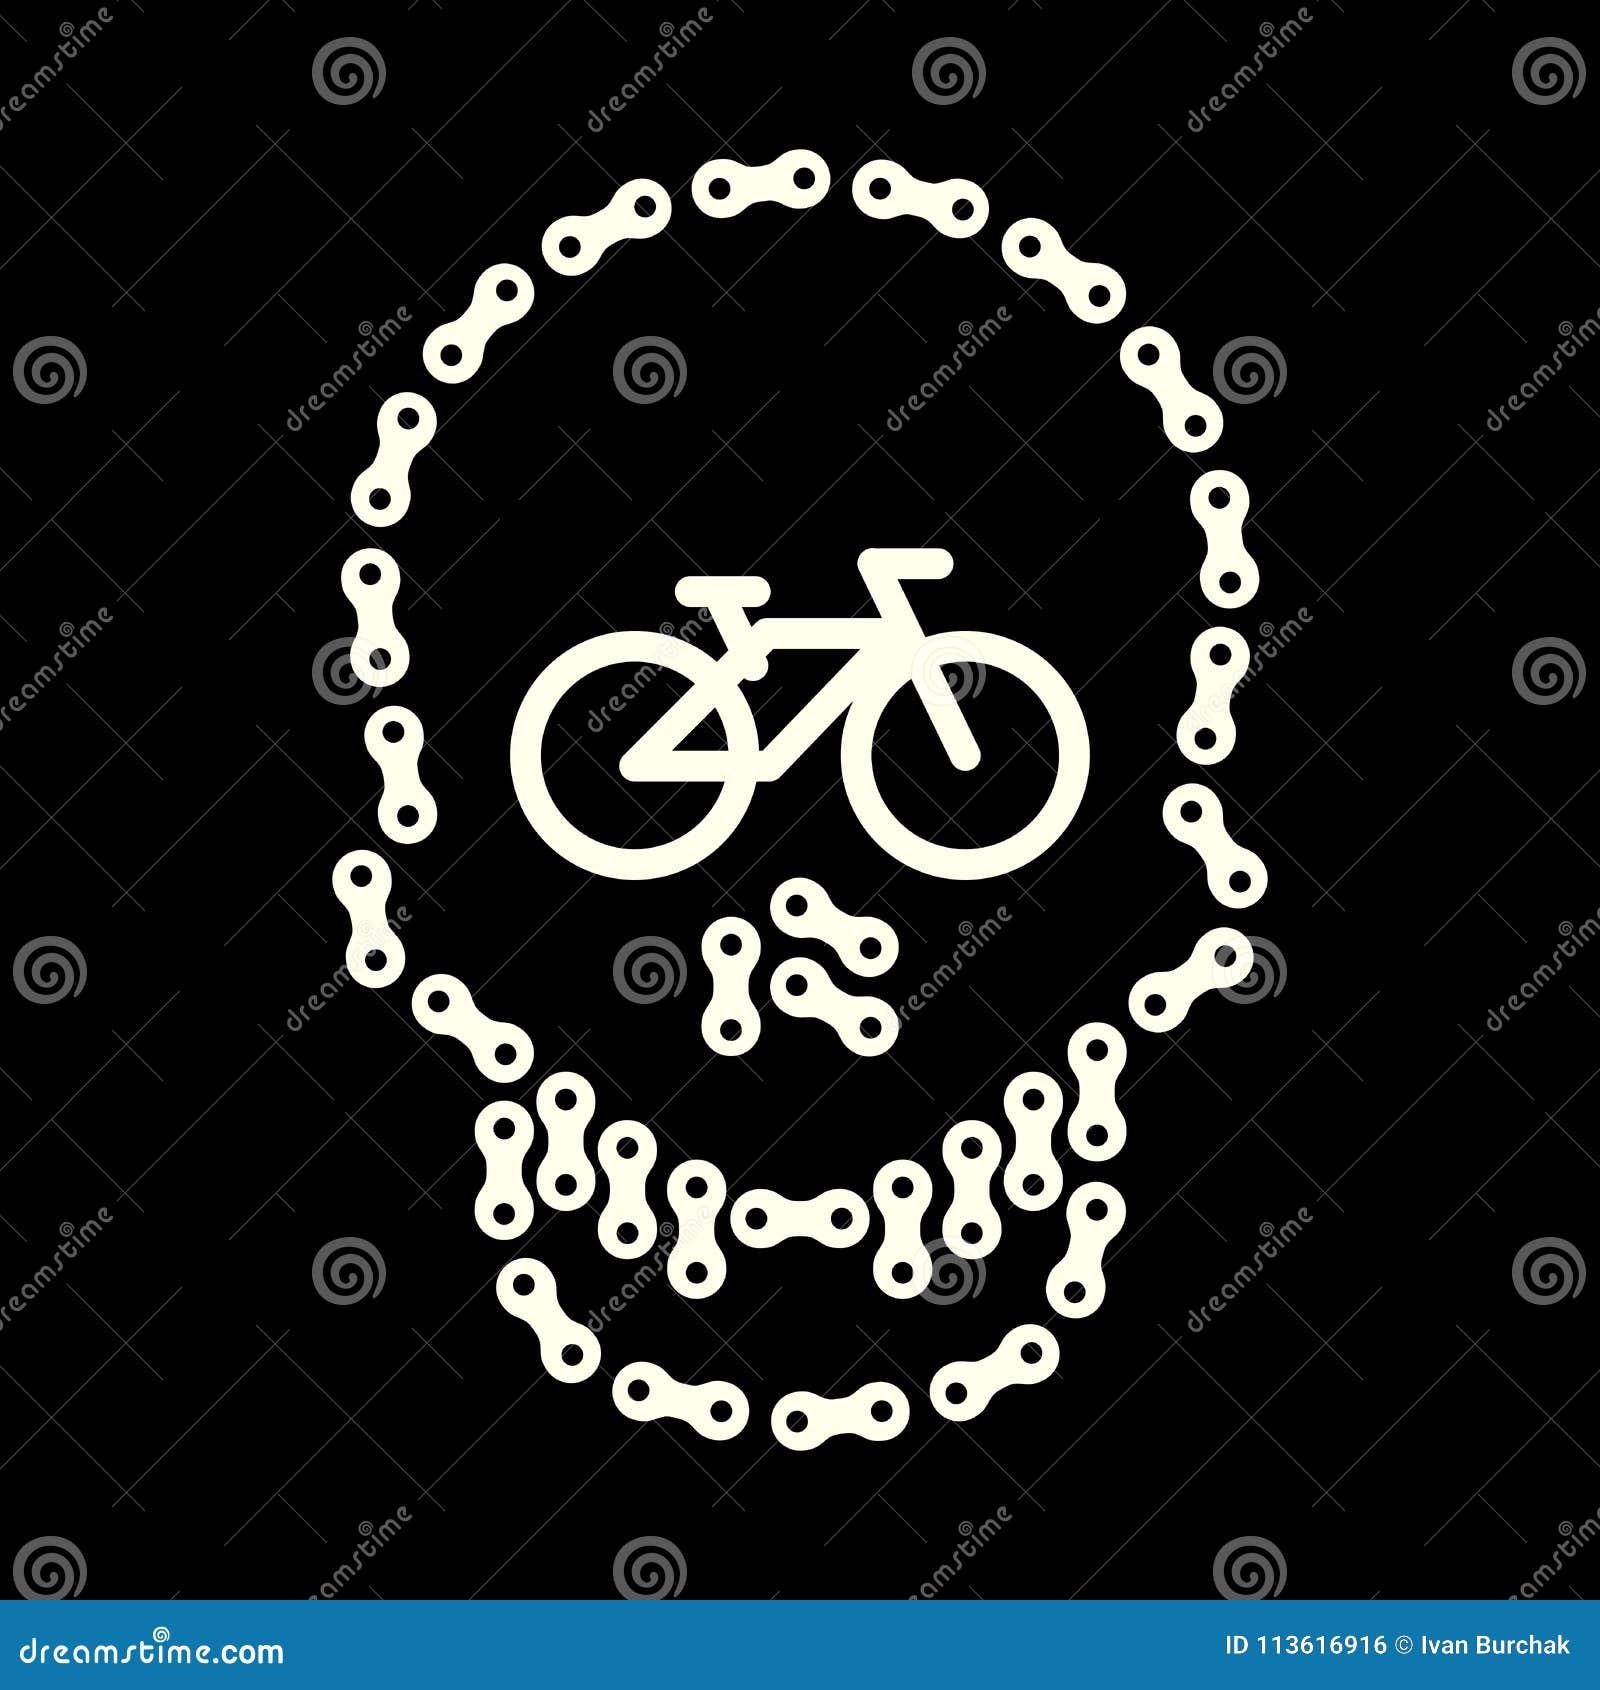 Vector Human Skull Made Of Bike Or Bicycle Chain Skull And Bike